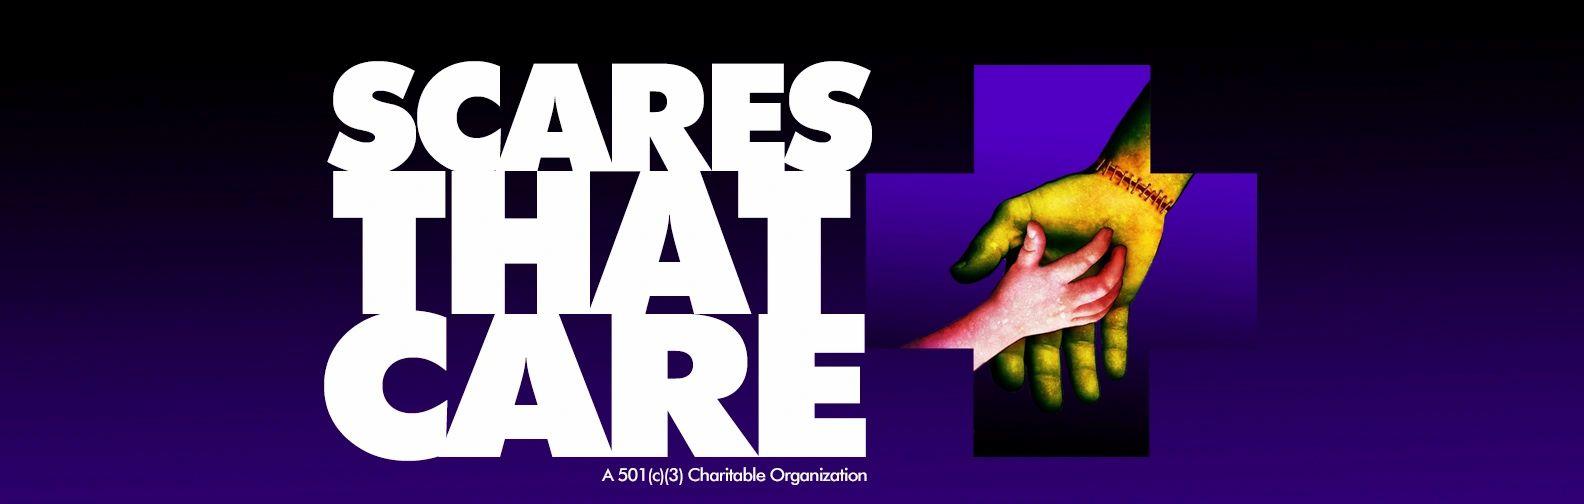 (c) Scaresthatcare.org